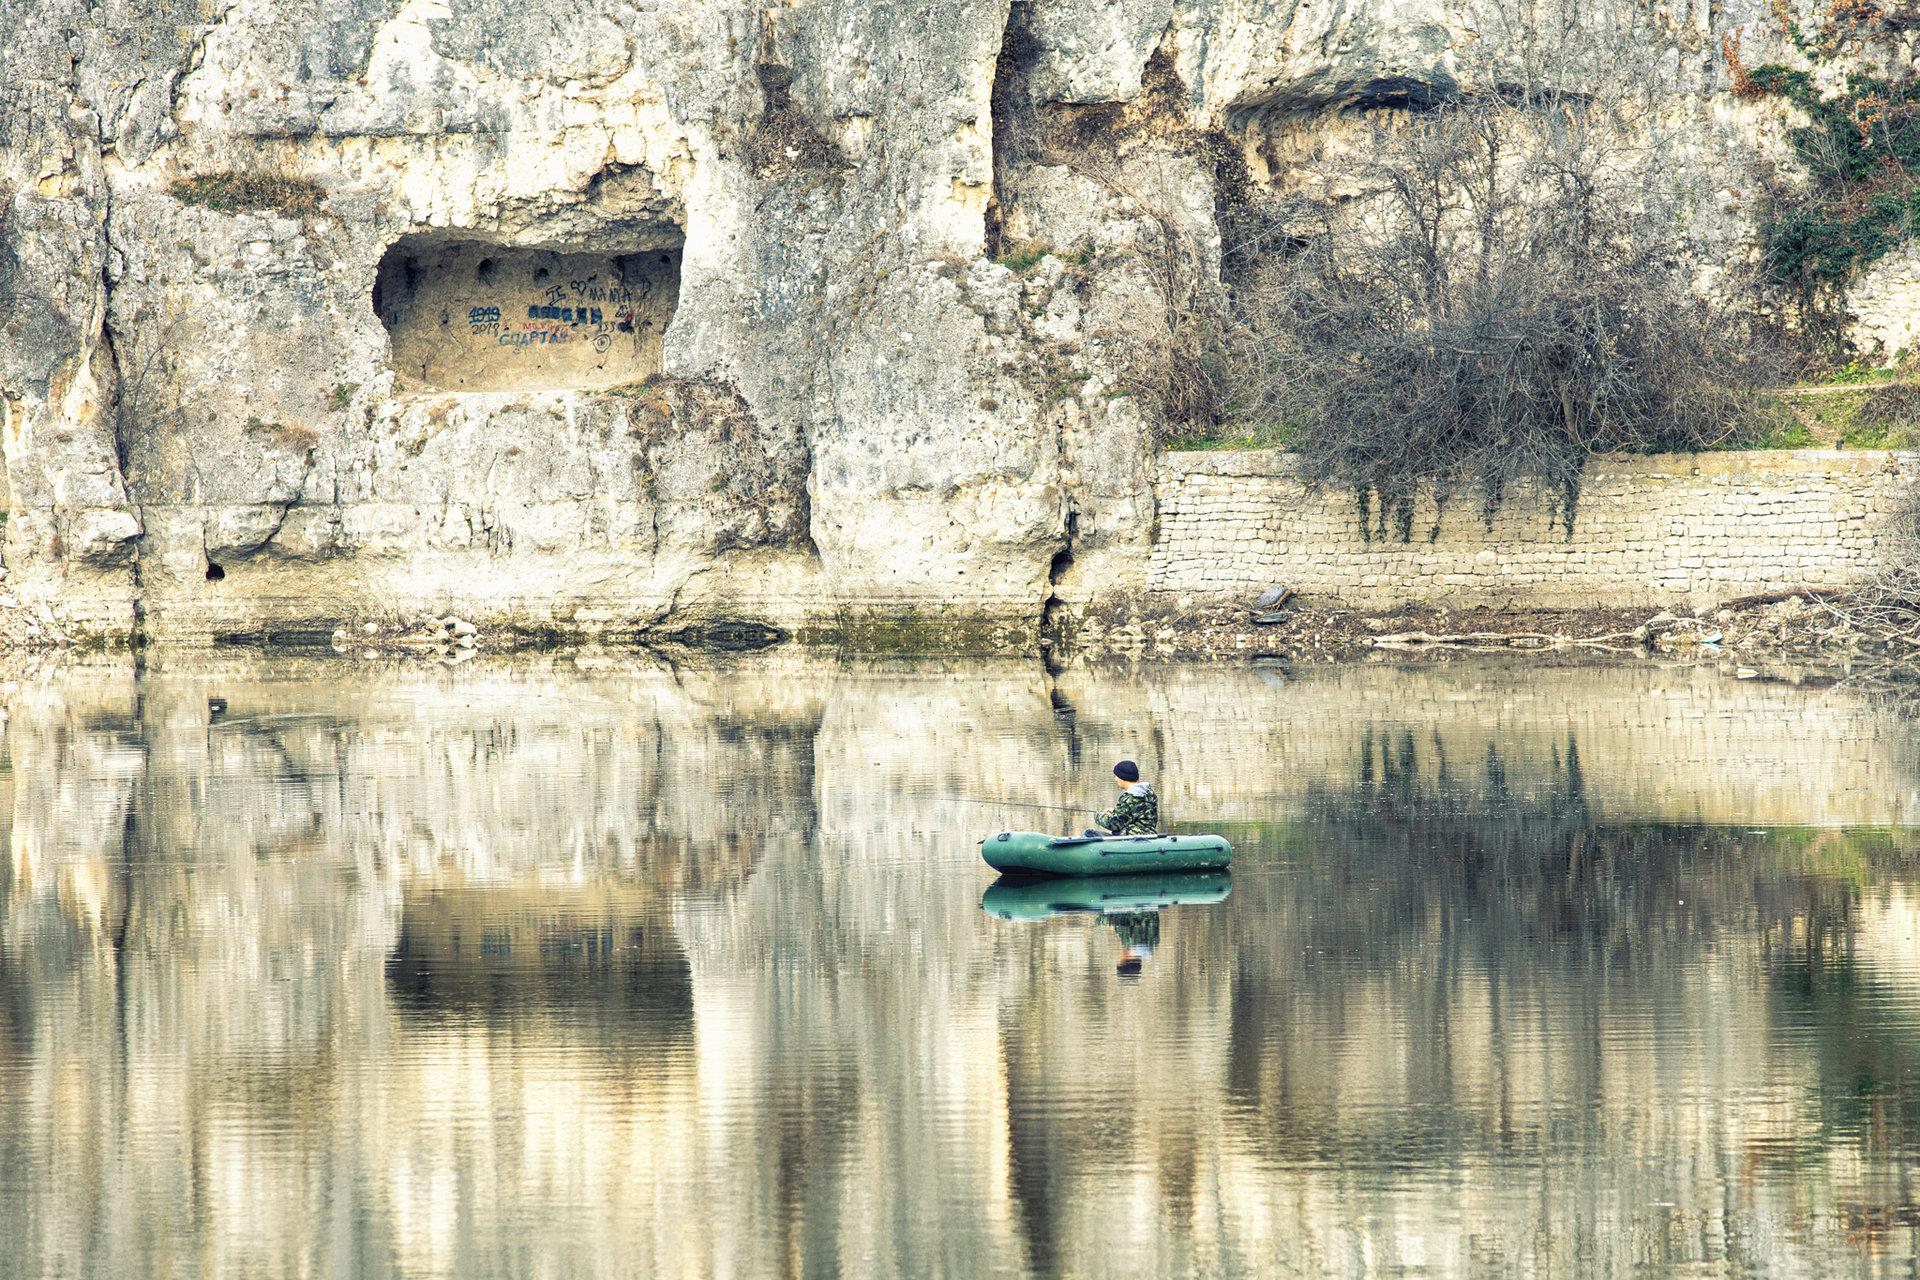 Photo in Nature | Author miro63 | PHOTO FORUM